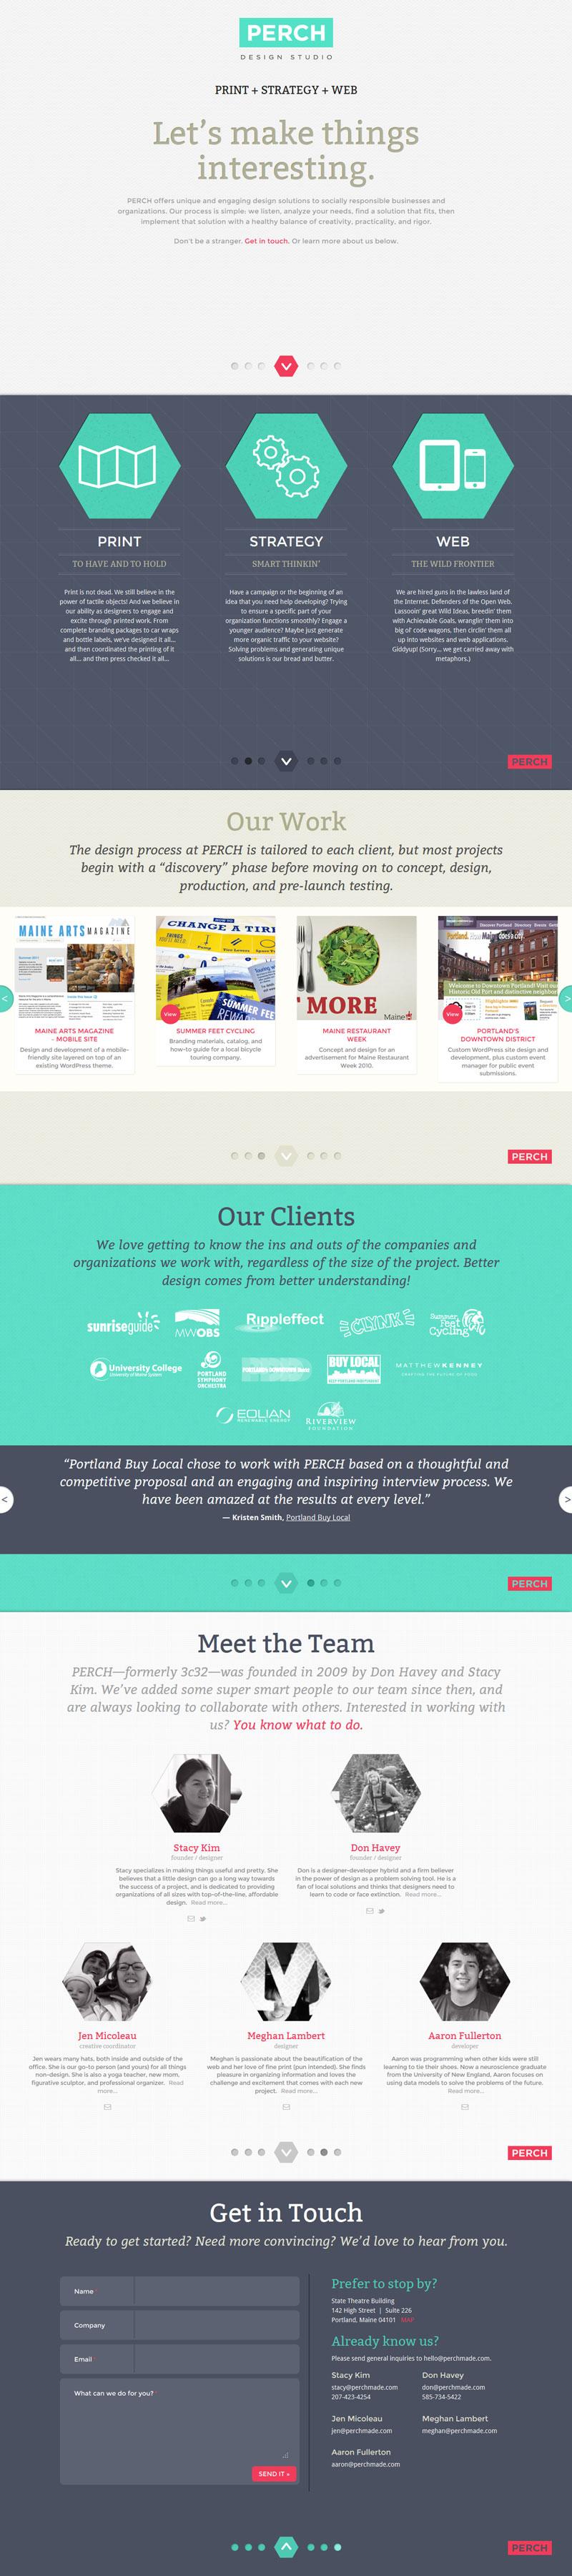 Perch Design Studio Flat Web Design Design Studio Website Inspiration